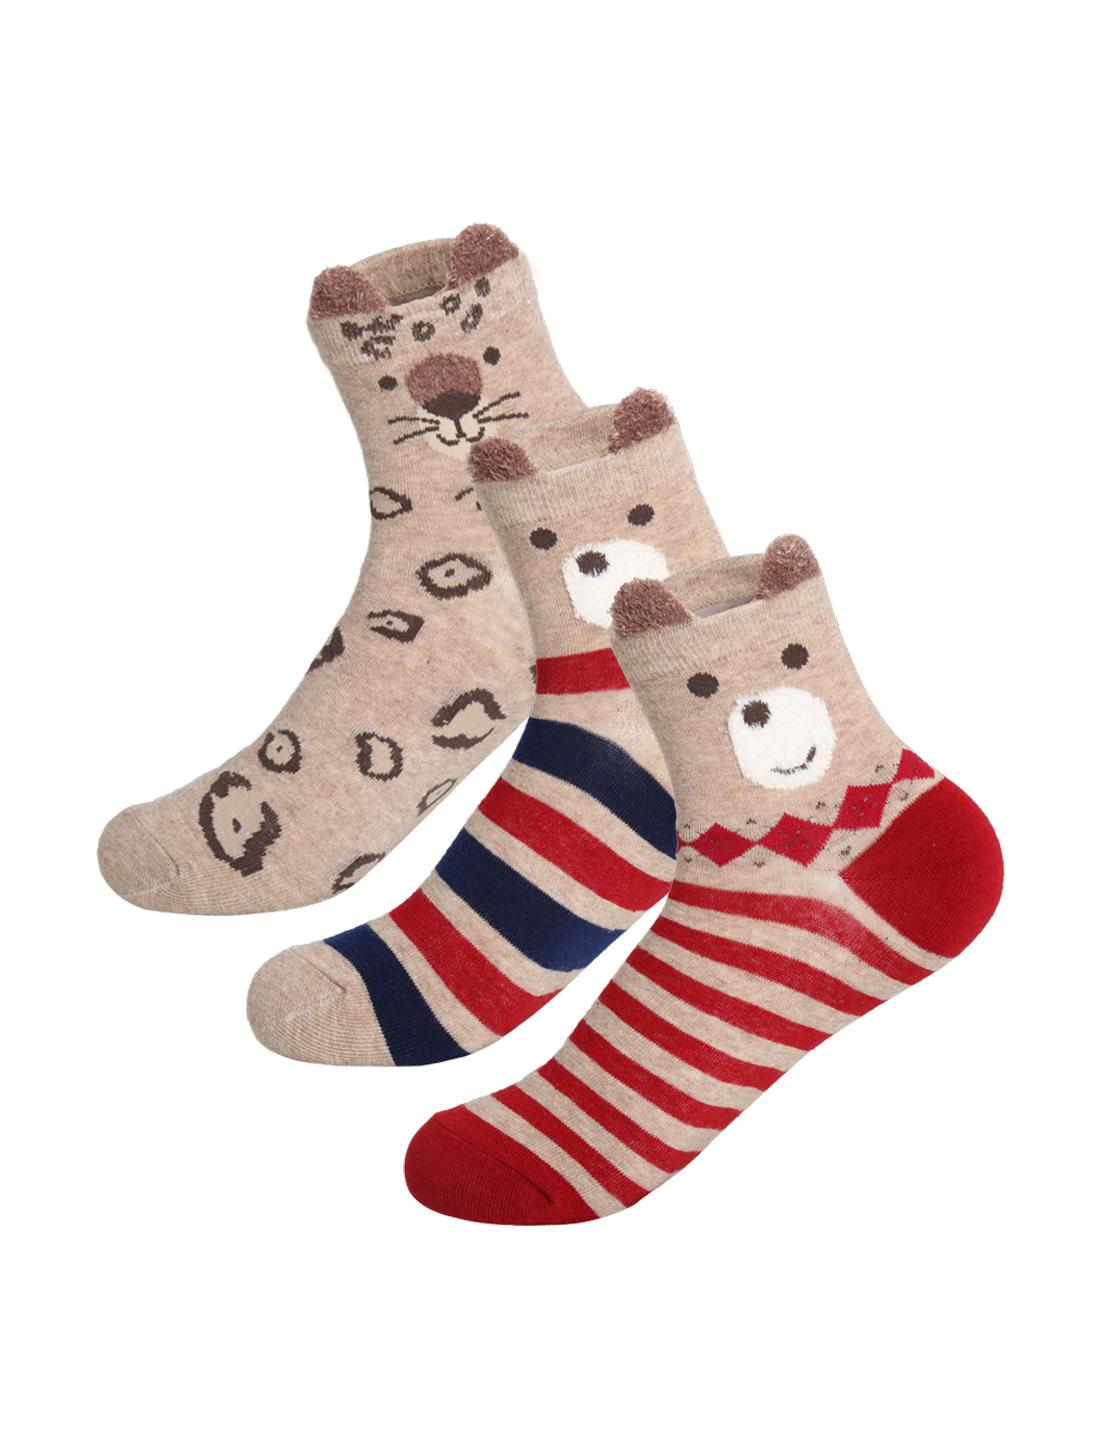 Women 3 pair Animal Stripes Novelty Pattern Crew Socks 9-11 Brown